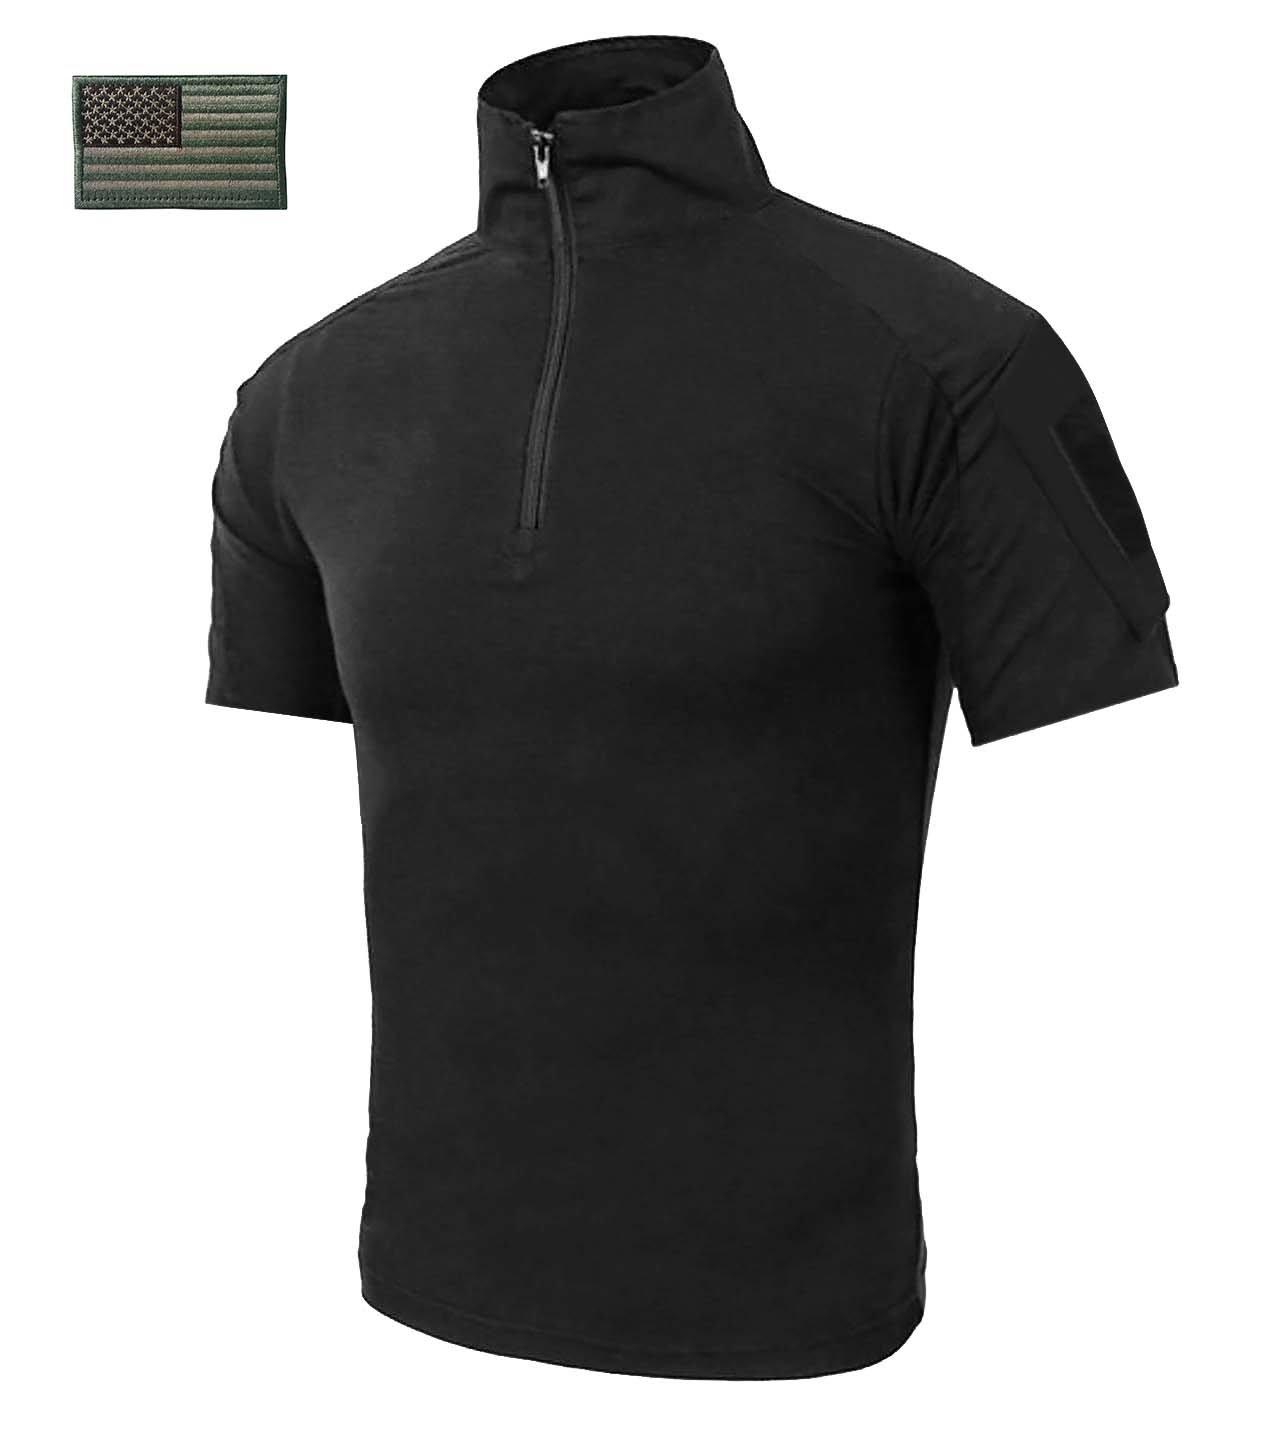 CRYSULLY Men's Summer Military Tactical Breathable Combat Sport Slim Fit Outdoor Shirt Atacs Combat Shirt Black